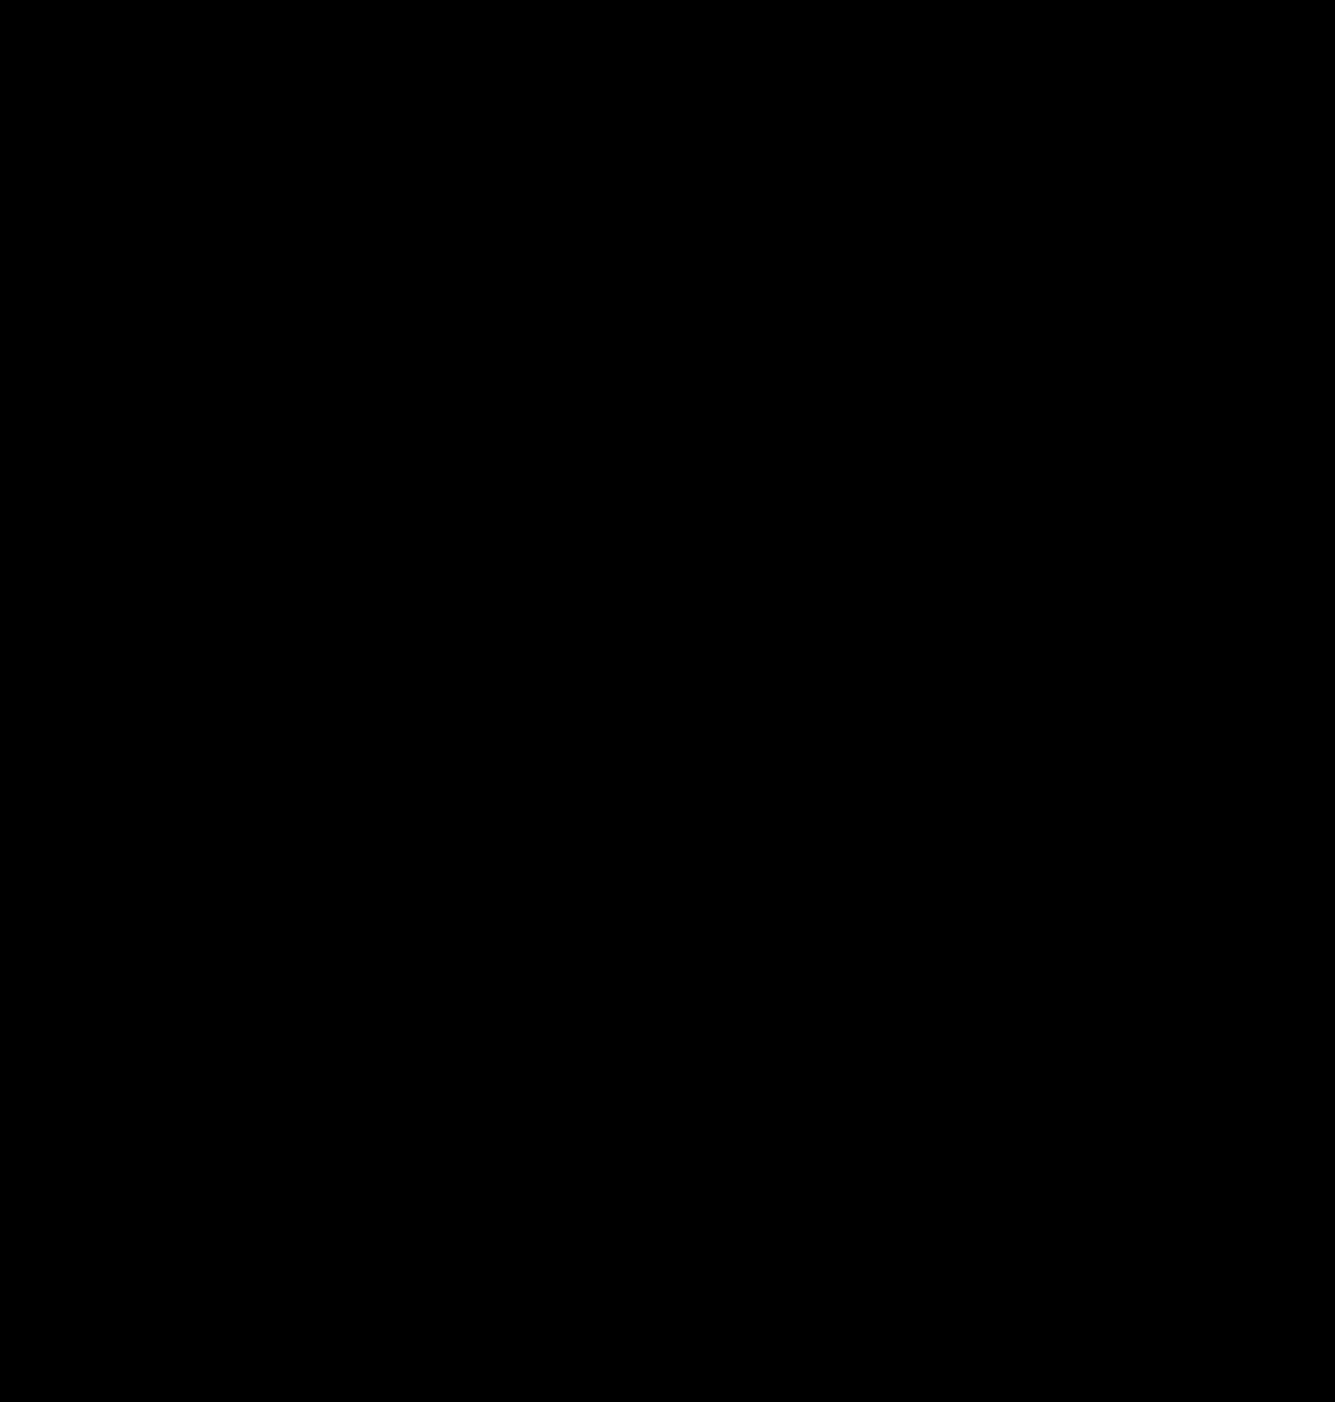 Twitch Logo Png White & Free Twitch Logo White.png ... - Twitch App Logo